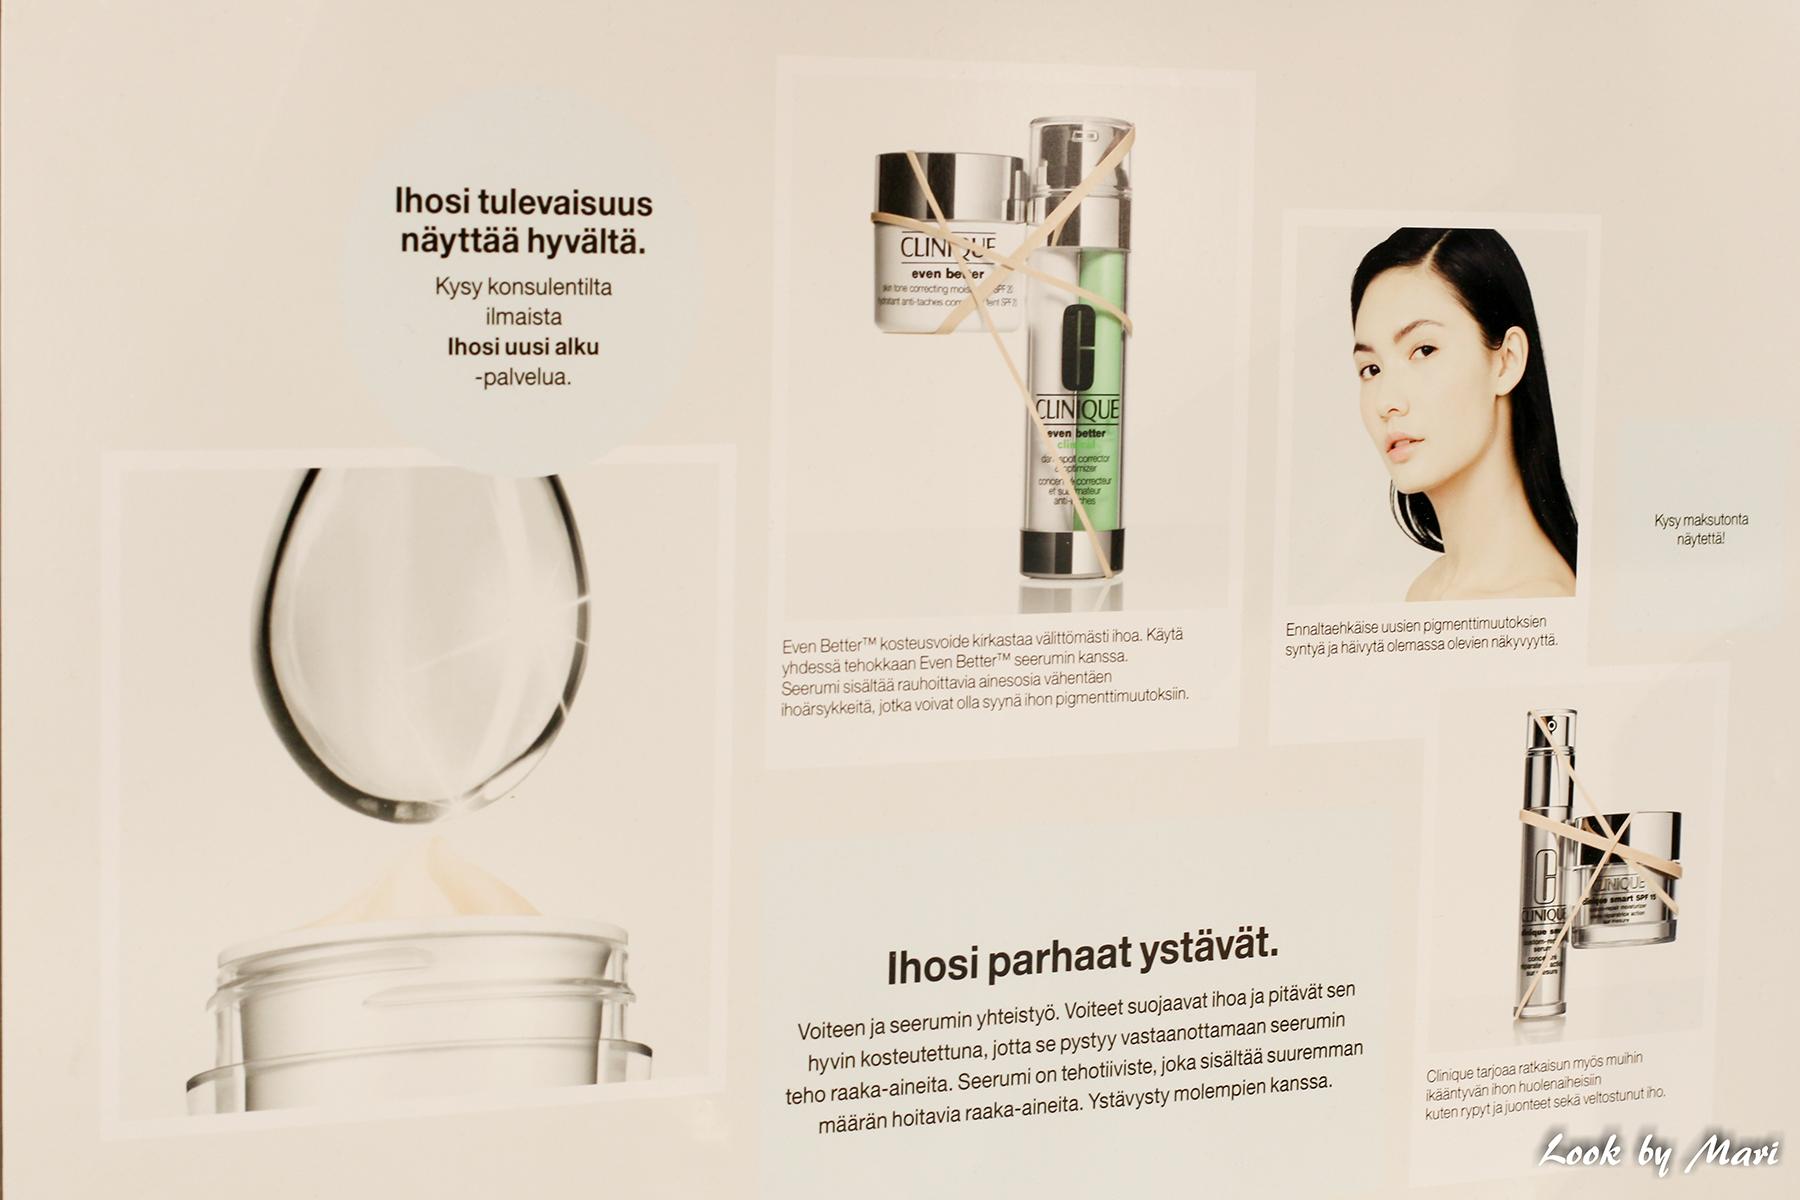 17 Clinique mat lipsticks helsinki stockman avajaiset 16 17.3.2017 kutsuvieras tilaisuus success pr